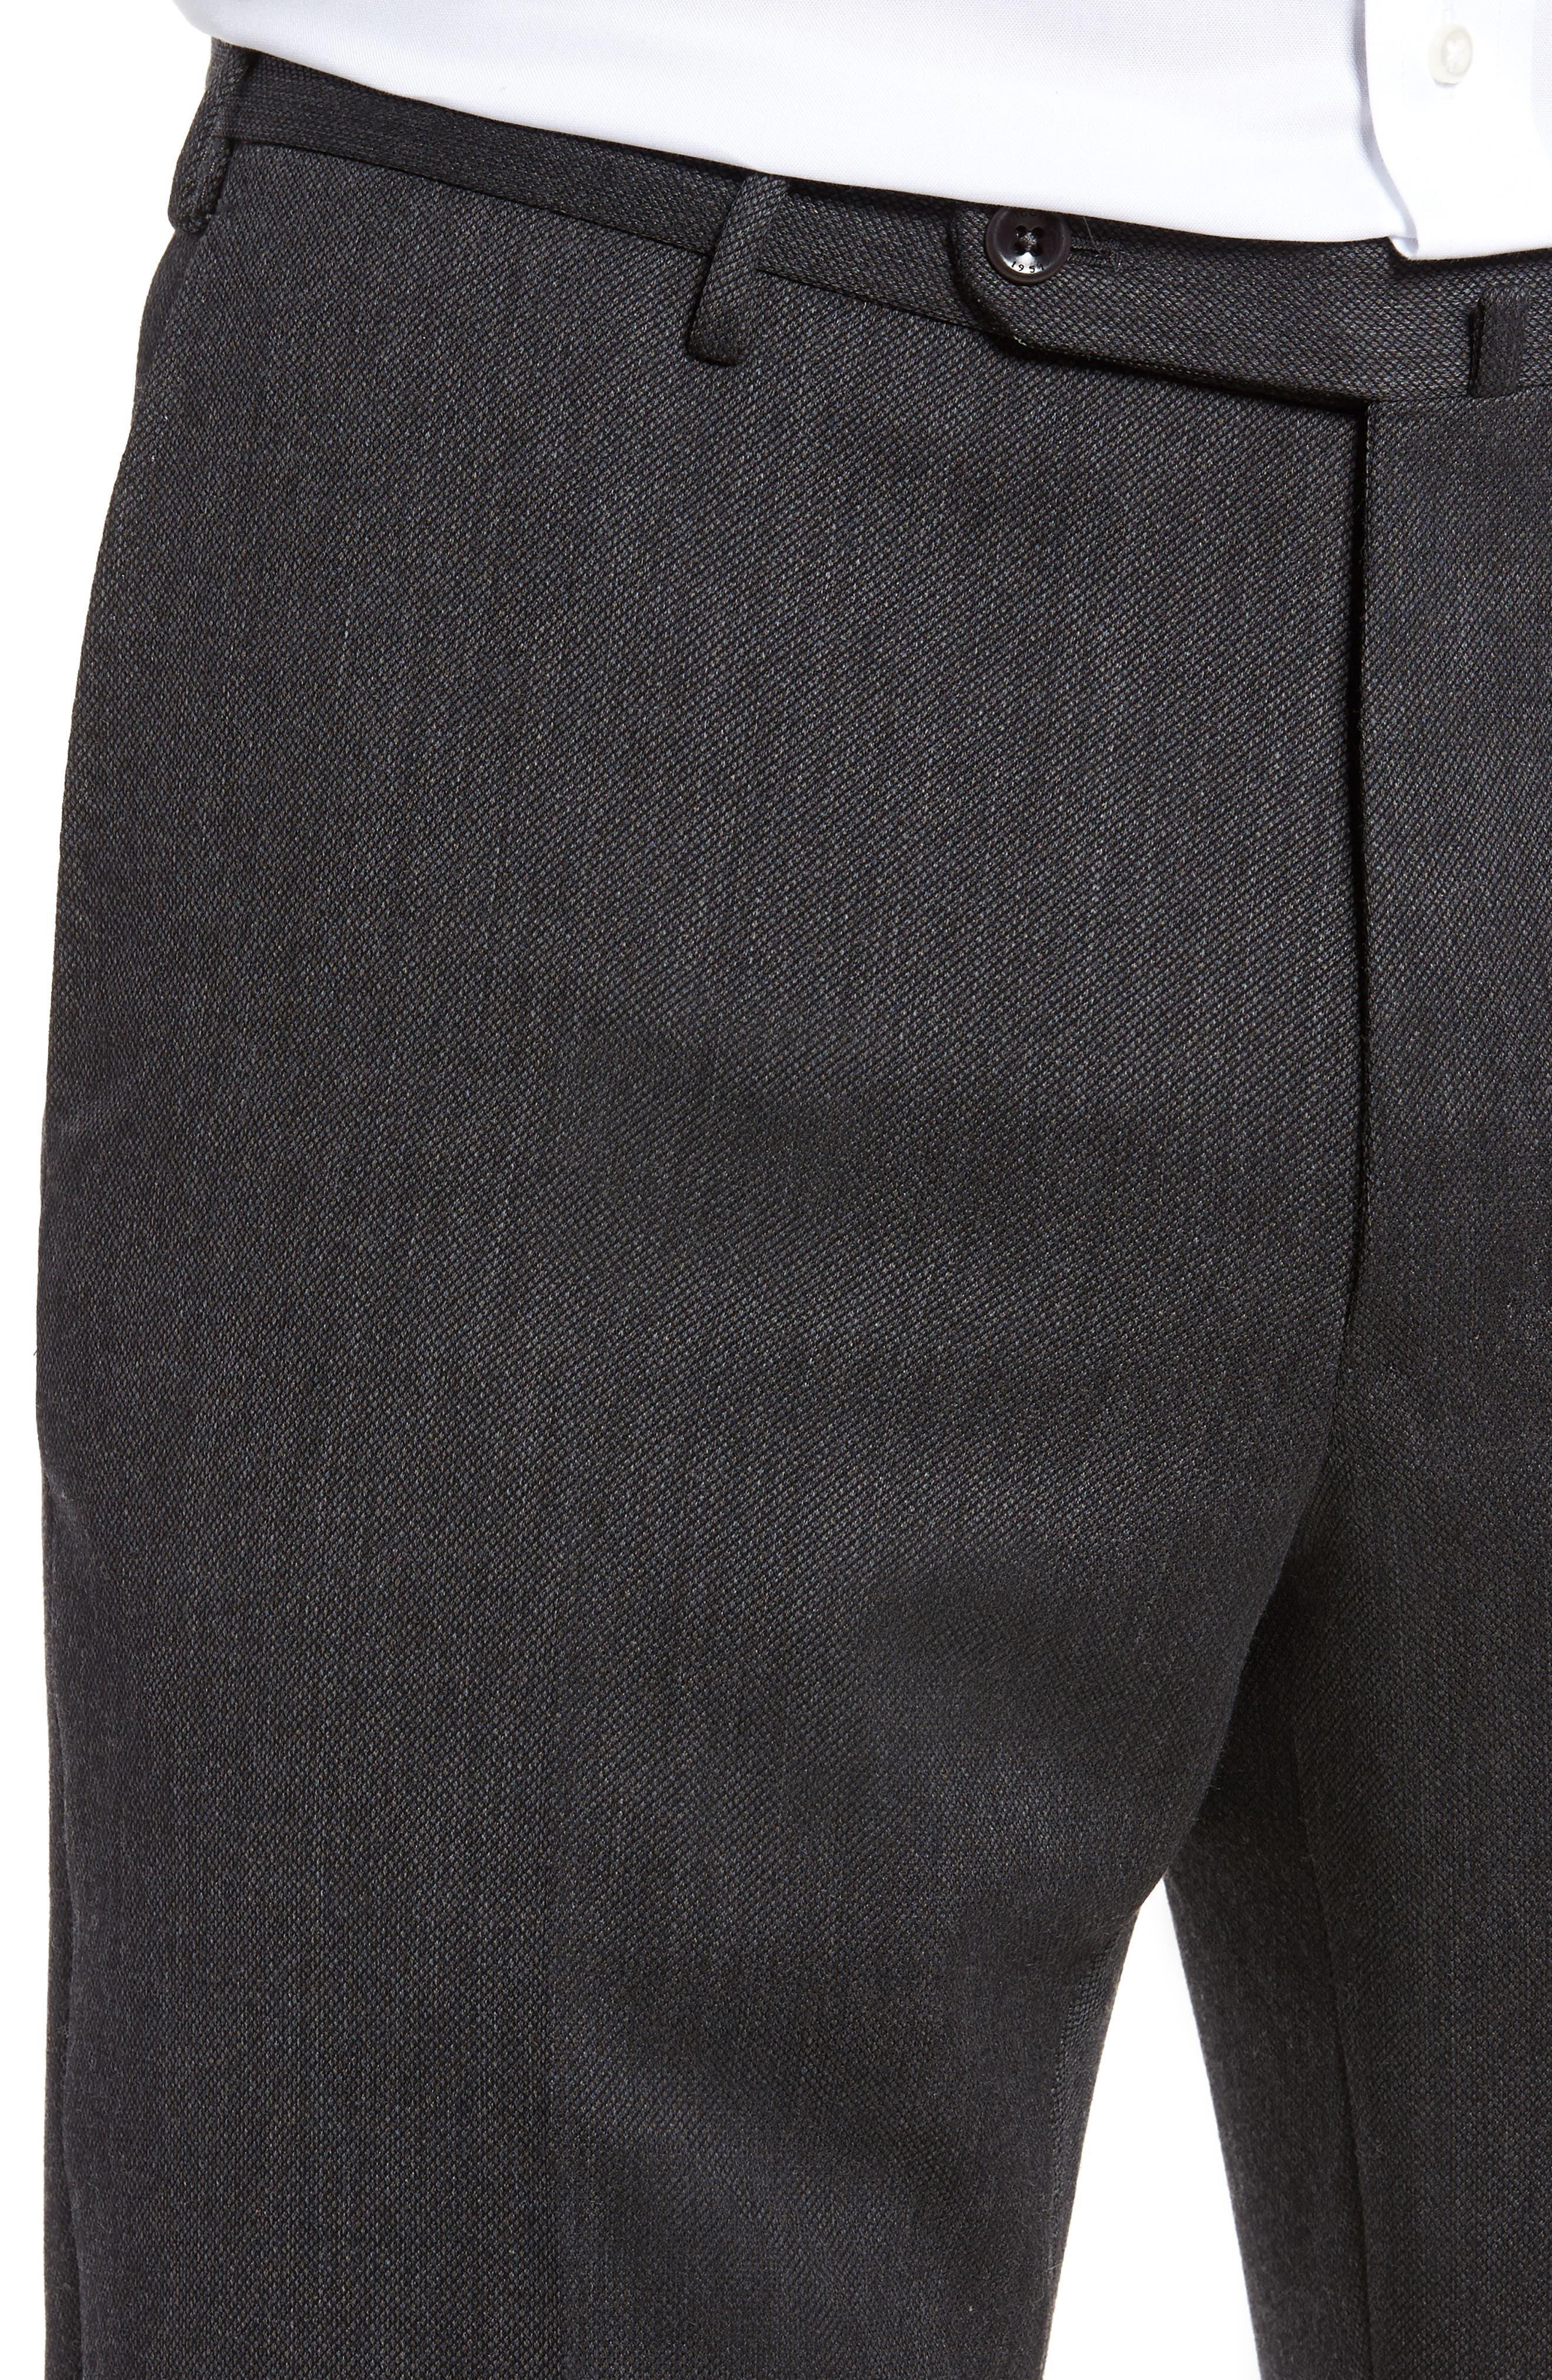 Benson Flat Front Wool Blend Trousers,                             Alternate thumbnail 5, color,                             Dark Grey